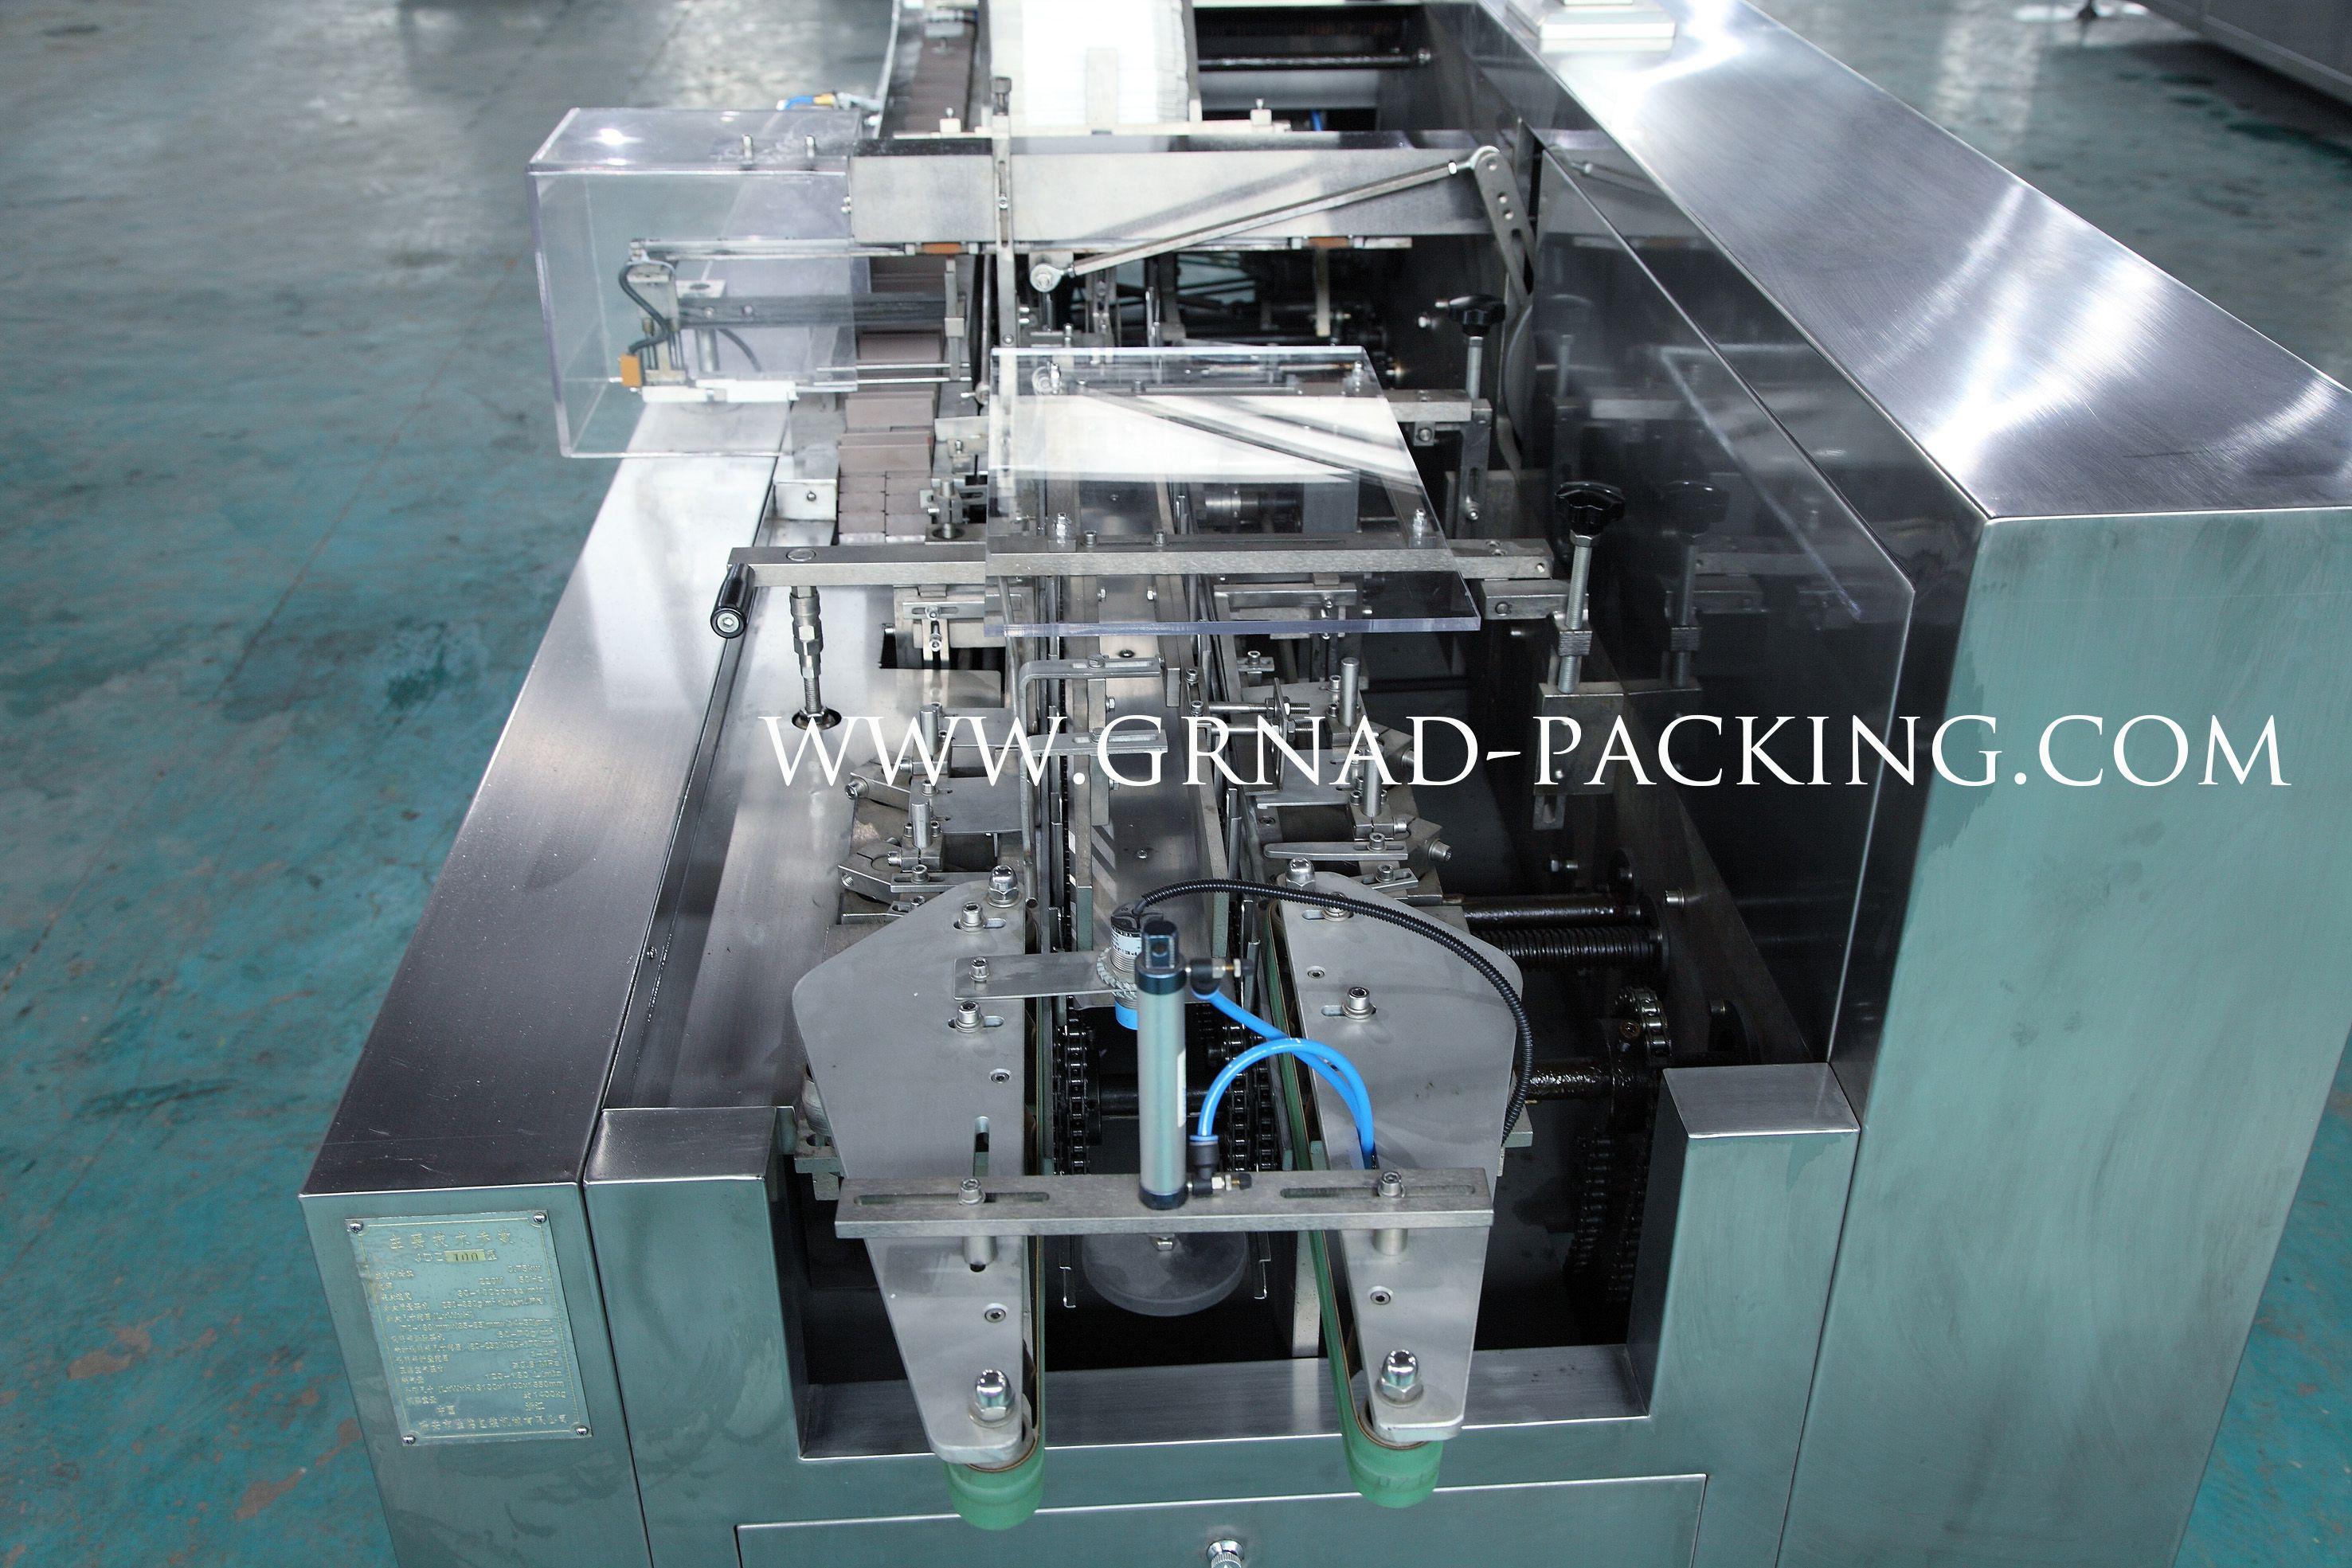 Carton Sealer Carton Packing Machine Box Sealer Box Sealer Carton Sealing Machine Carton Box Manufacturing Machines Price B Electrical Components Bottle Espresso Machine